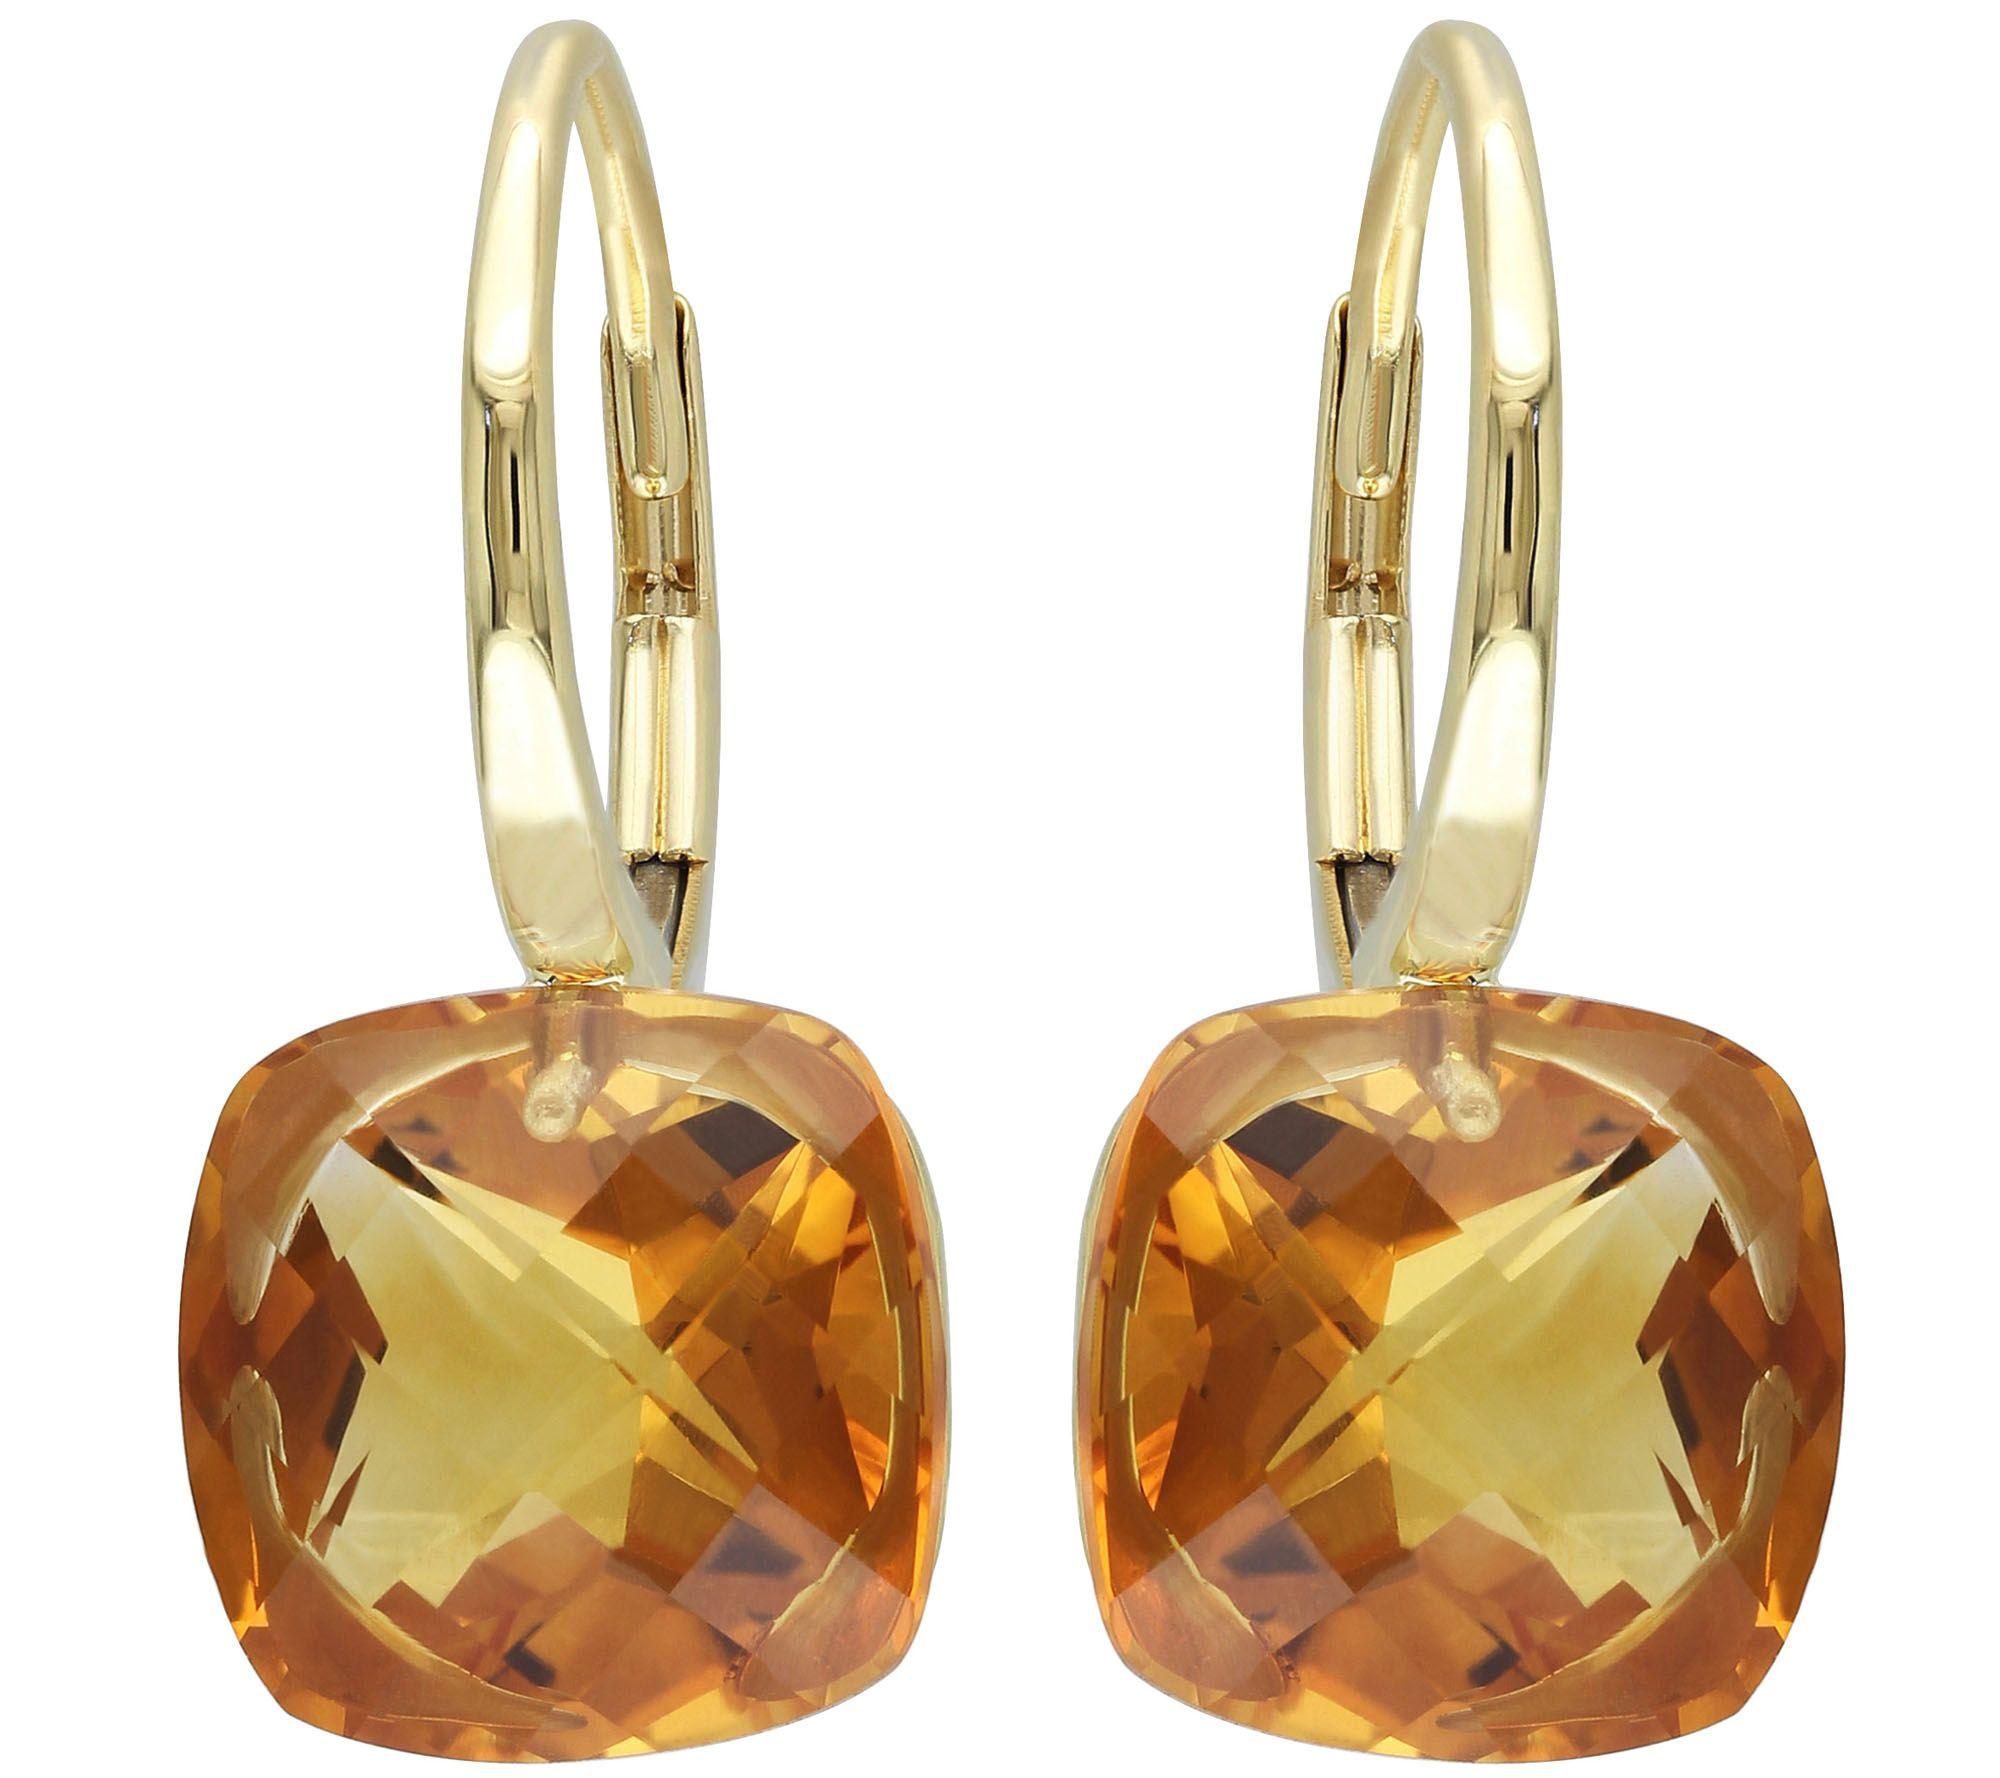 585c0f0dc 8.00 cttw Madeira Citrine Earrings, 14K Gold — QVC.com